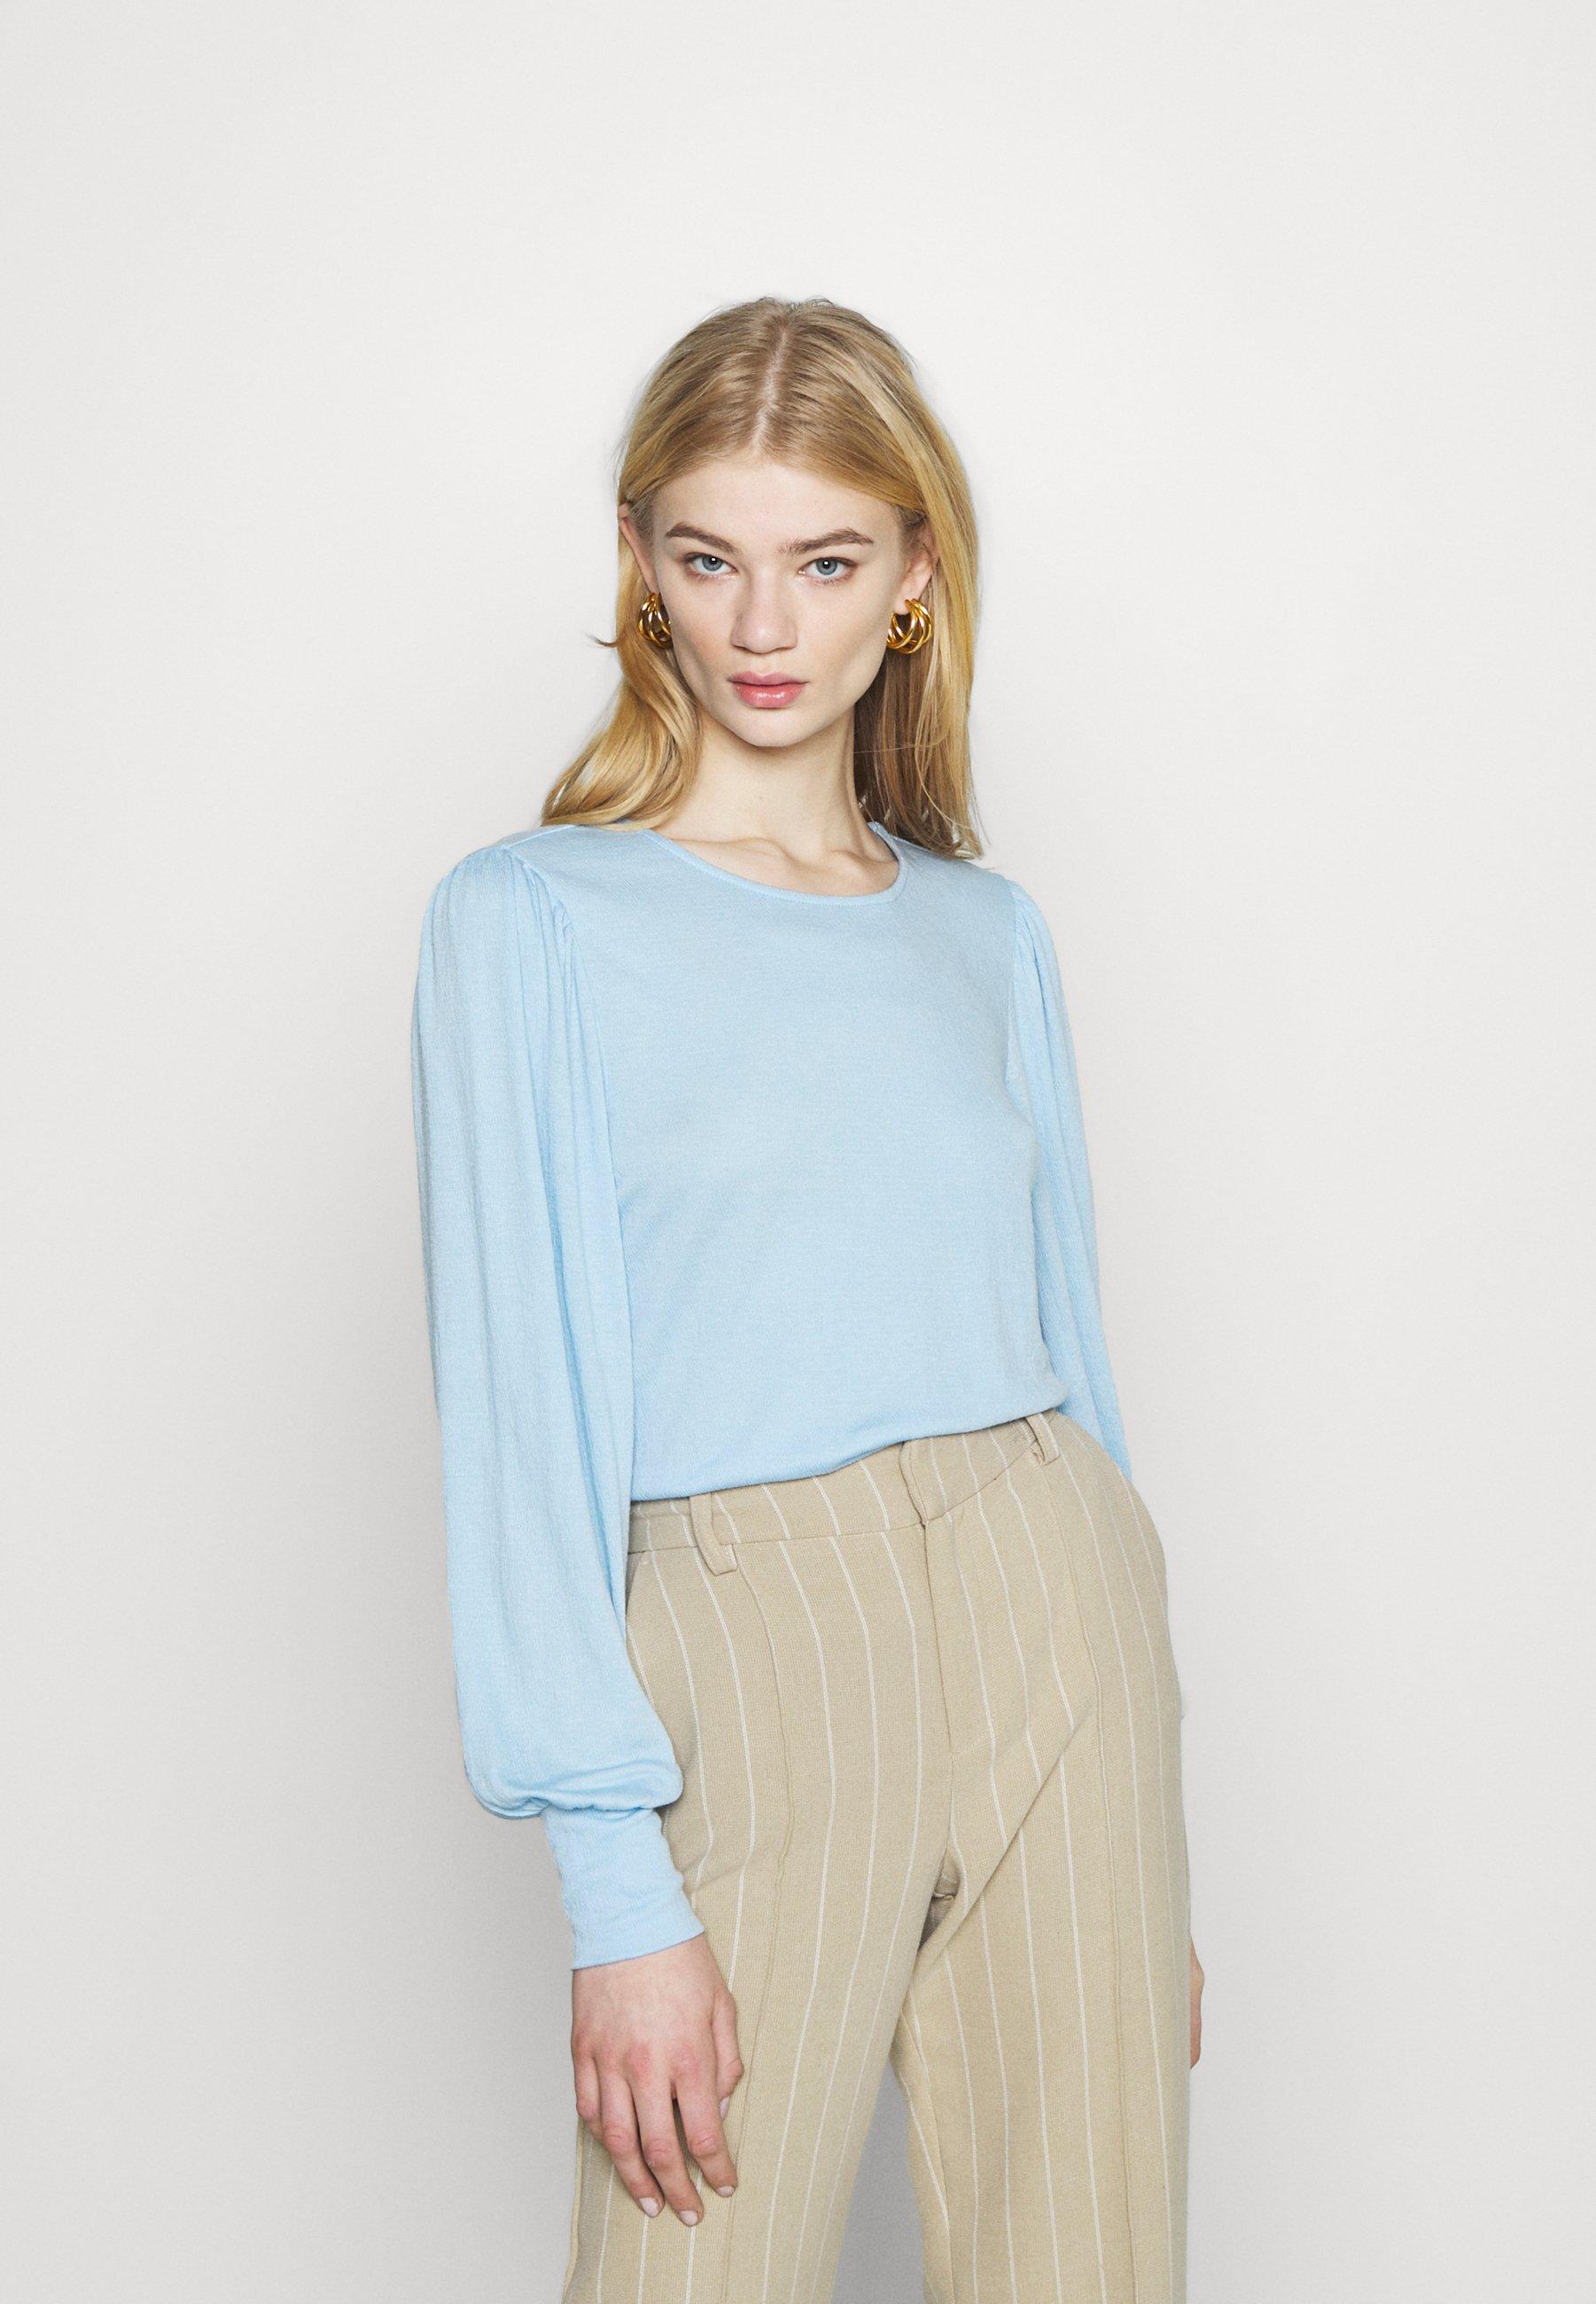 Femme VISUVIA - T-shirt à manches longues